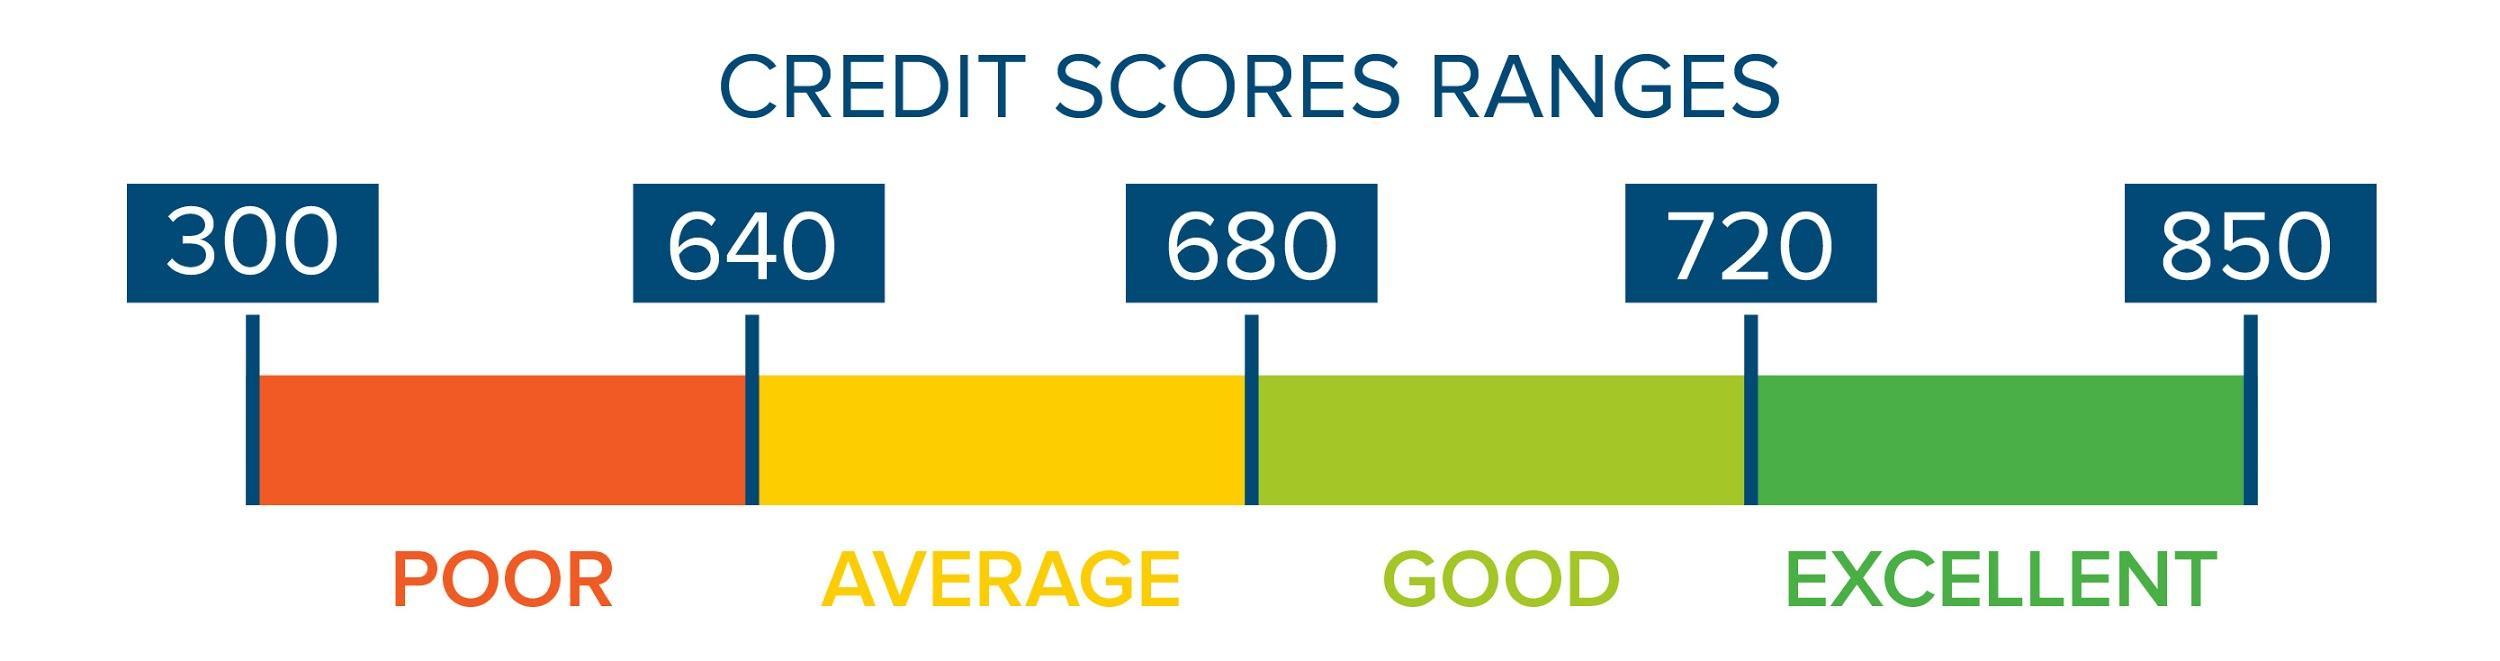 720 Credit Score >> Sheridan Community Federal Credit Union Phone Number 720